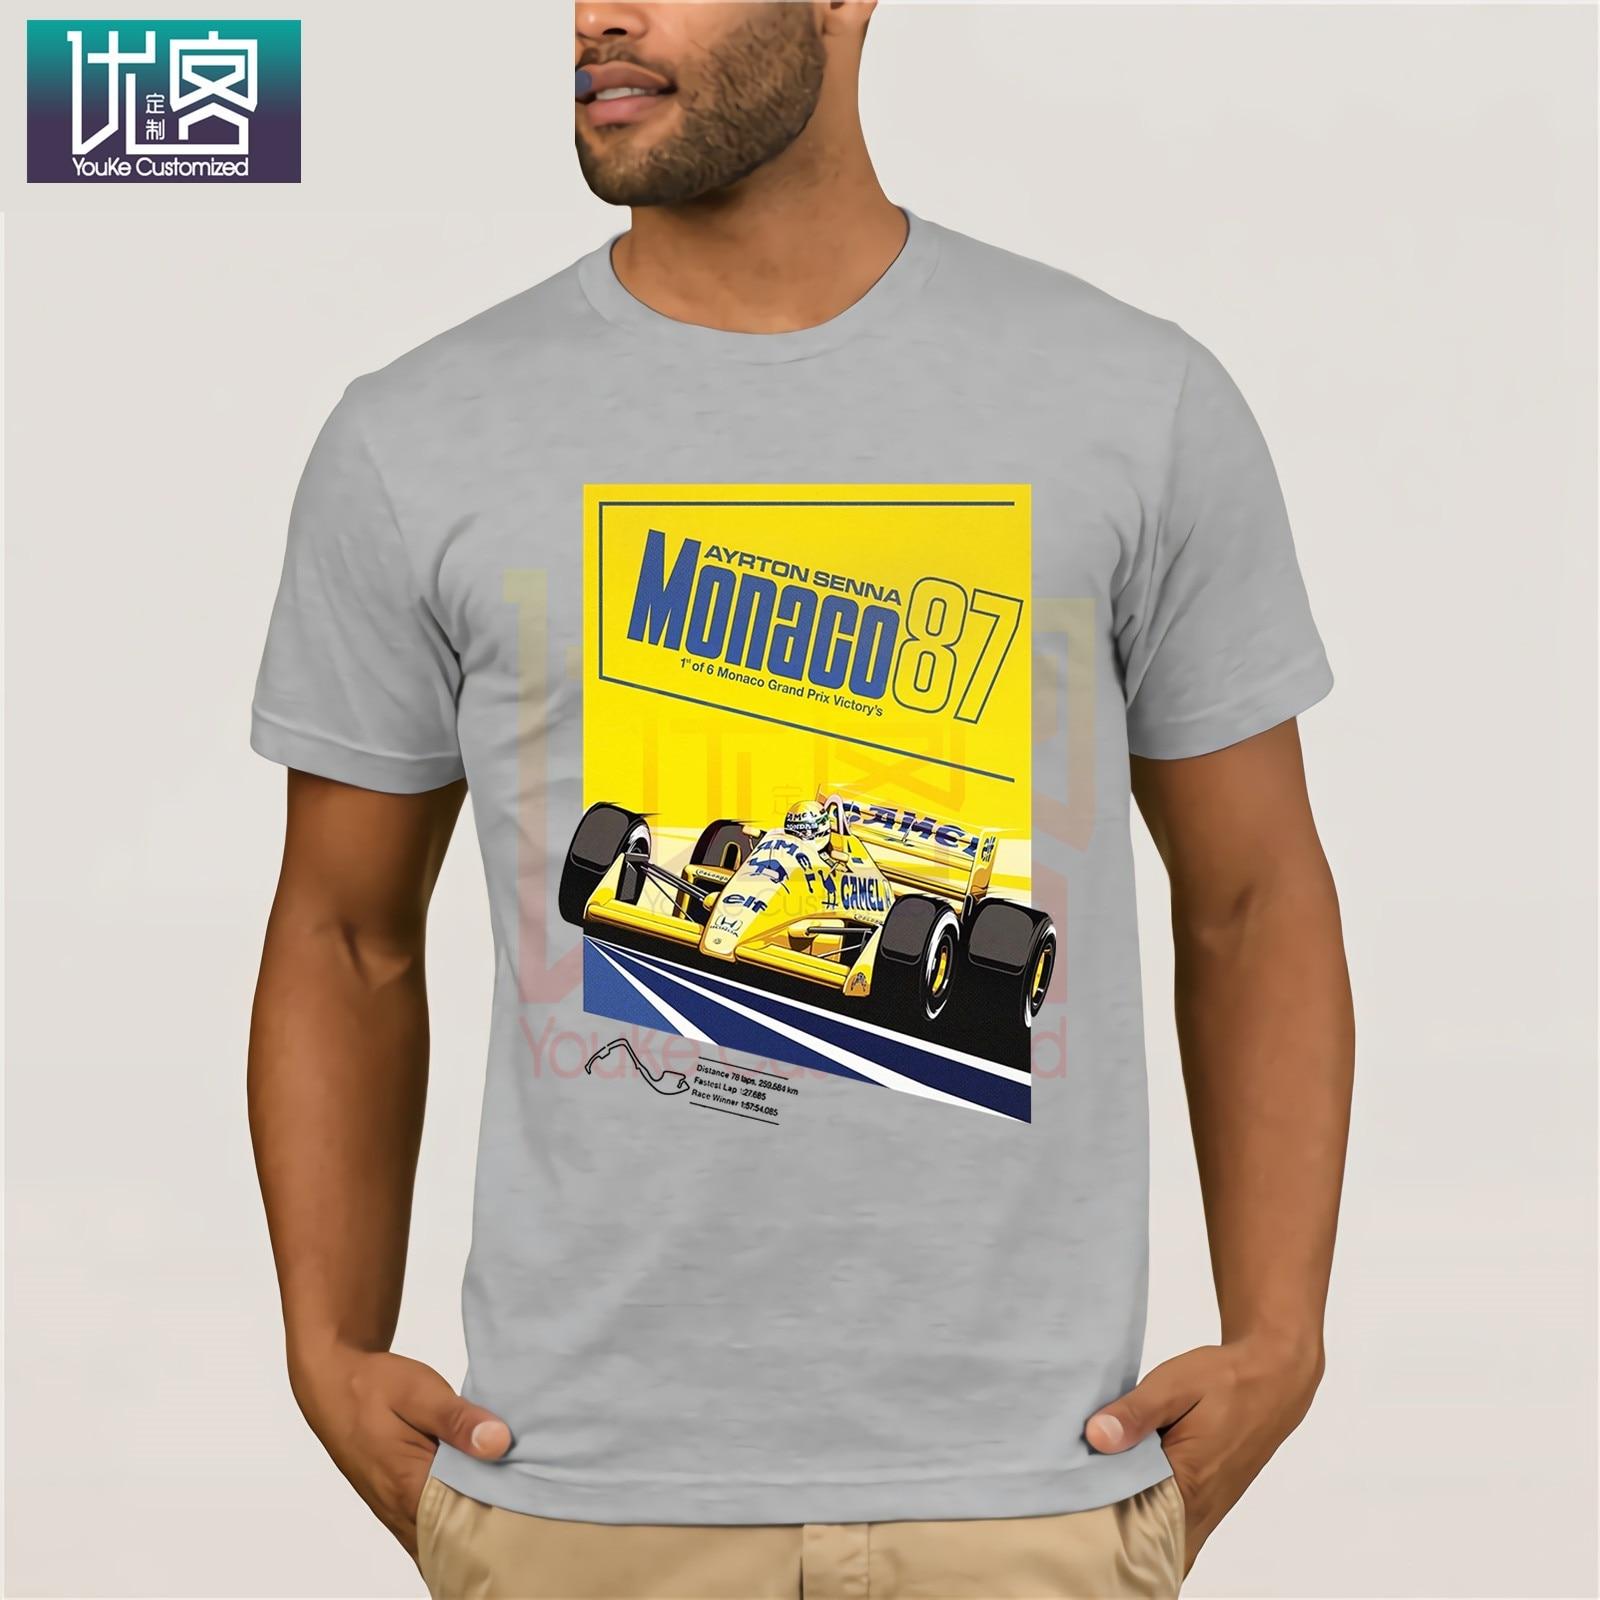 Ayrton Senna Posters Celebrate The Masters F1 Monaco camiseta Casual manga corta superior camiseta de humor camisa 100% algodón camisetas gráfico